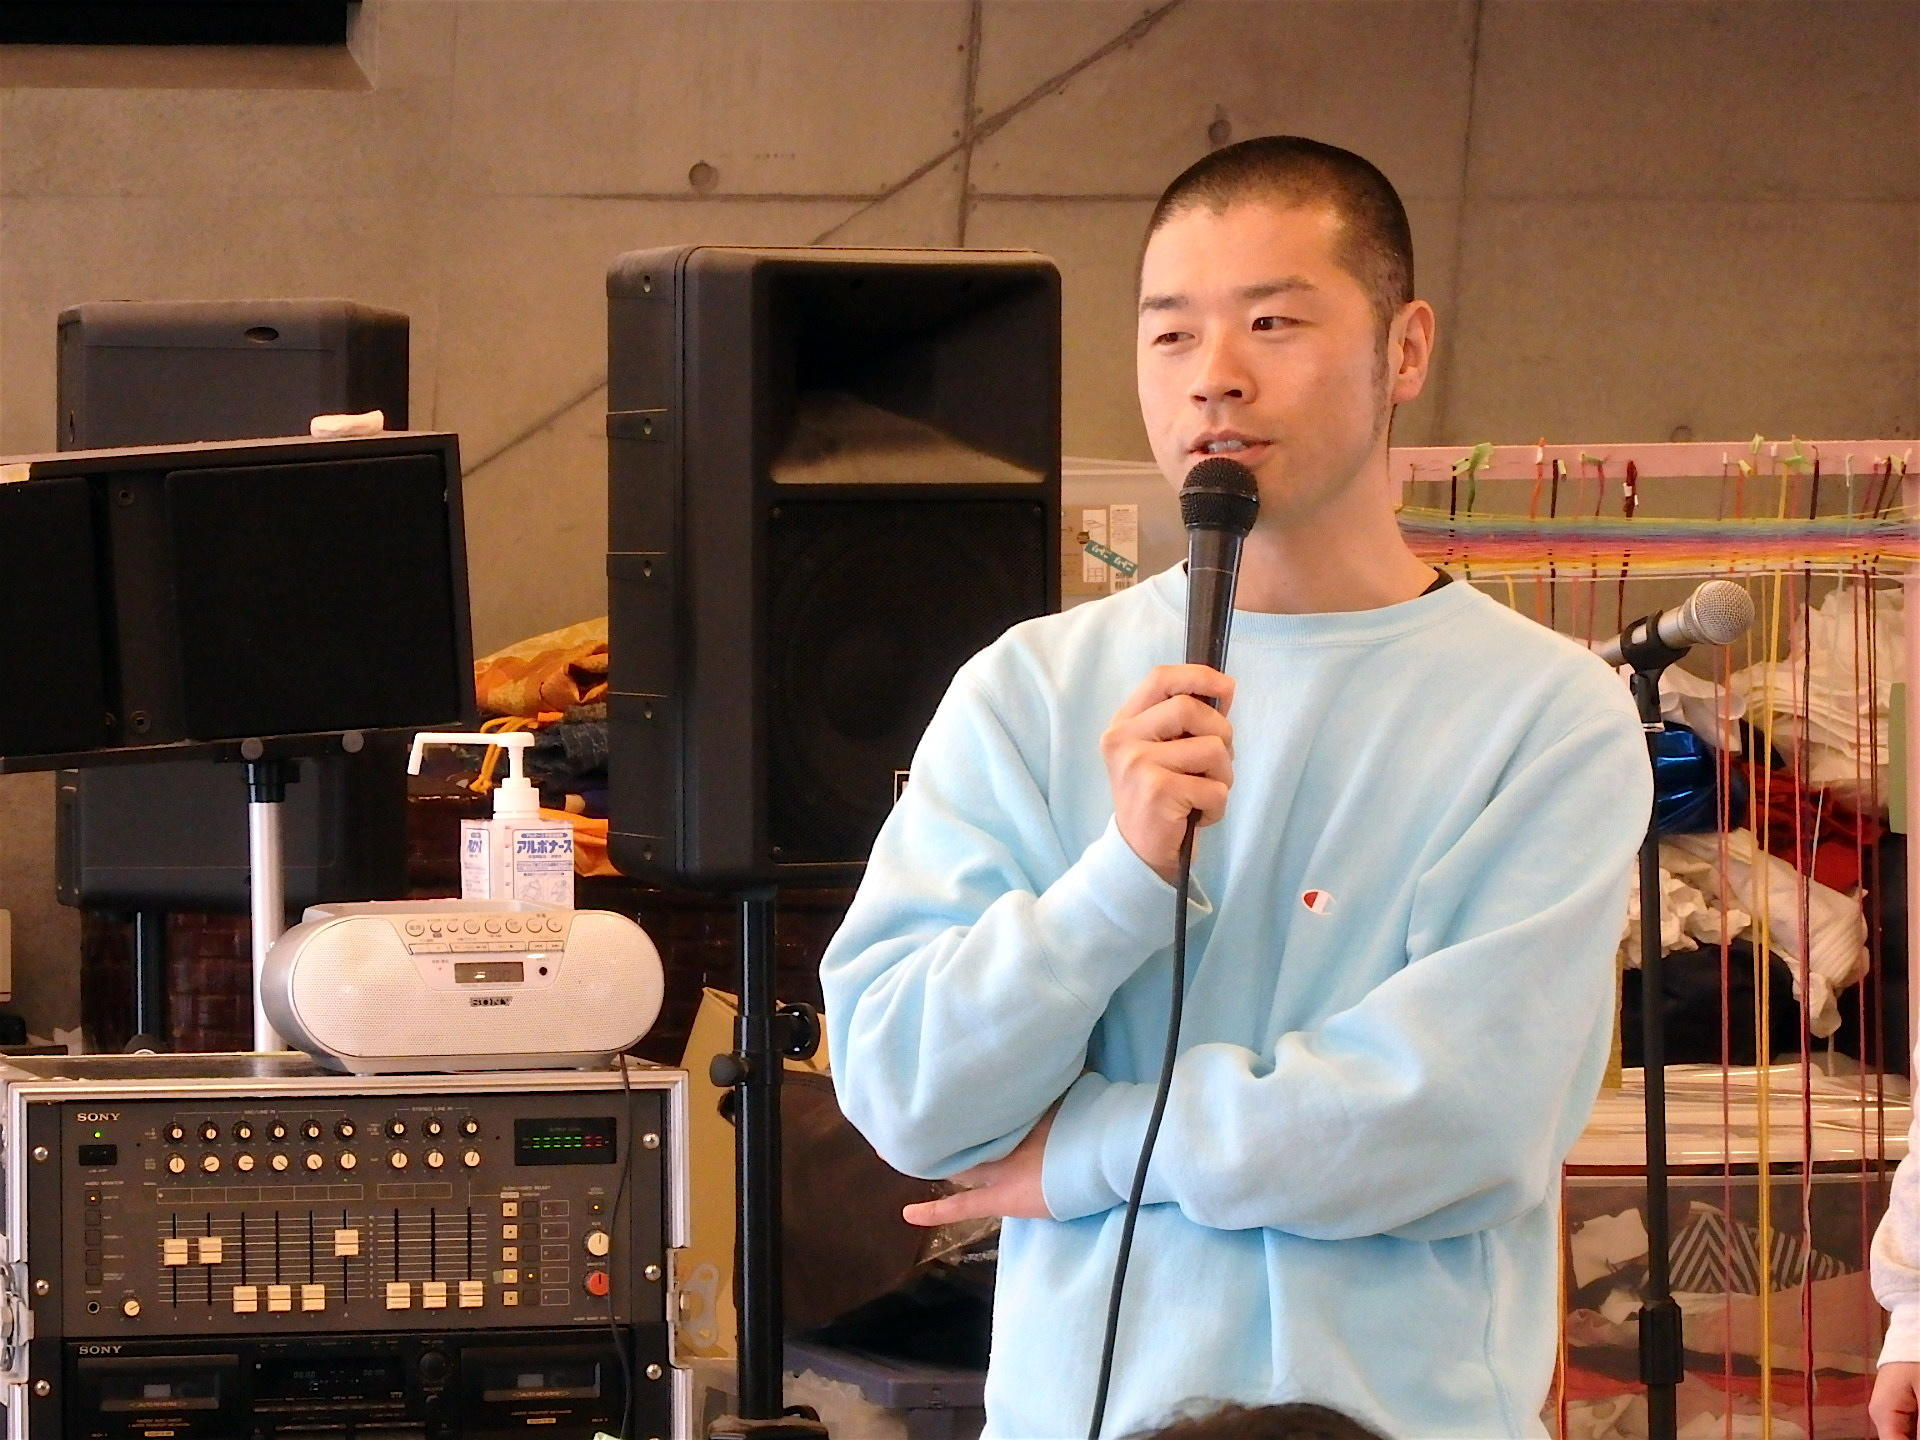 http://news.yoshimoto.co.jp/20160430235757-08f2740e19dda31a7361f7f3366d469b65464868.jpg